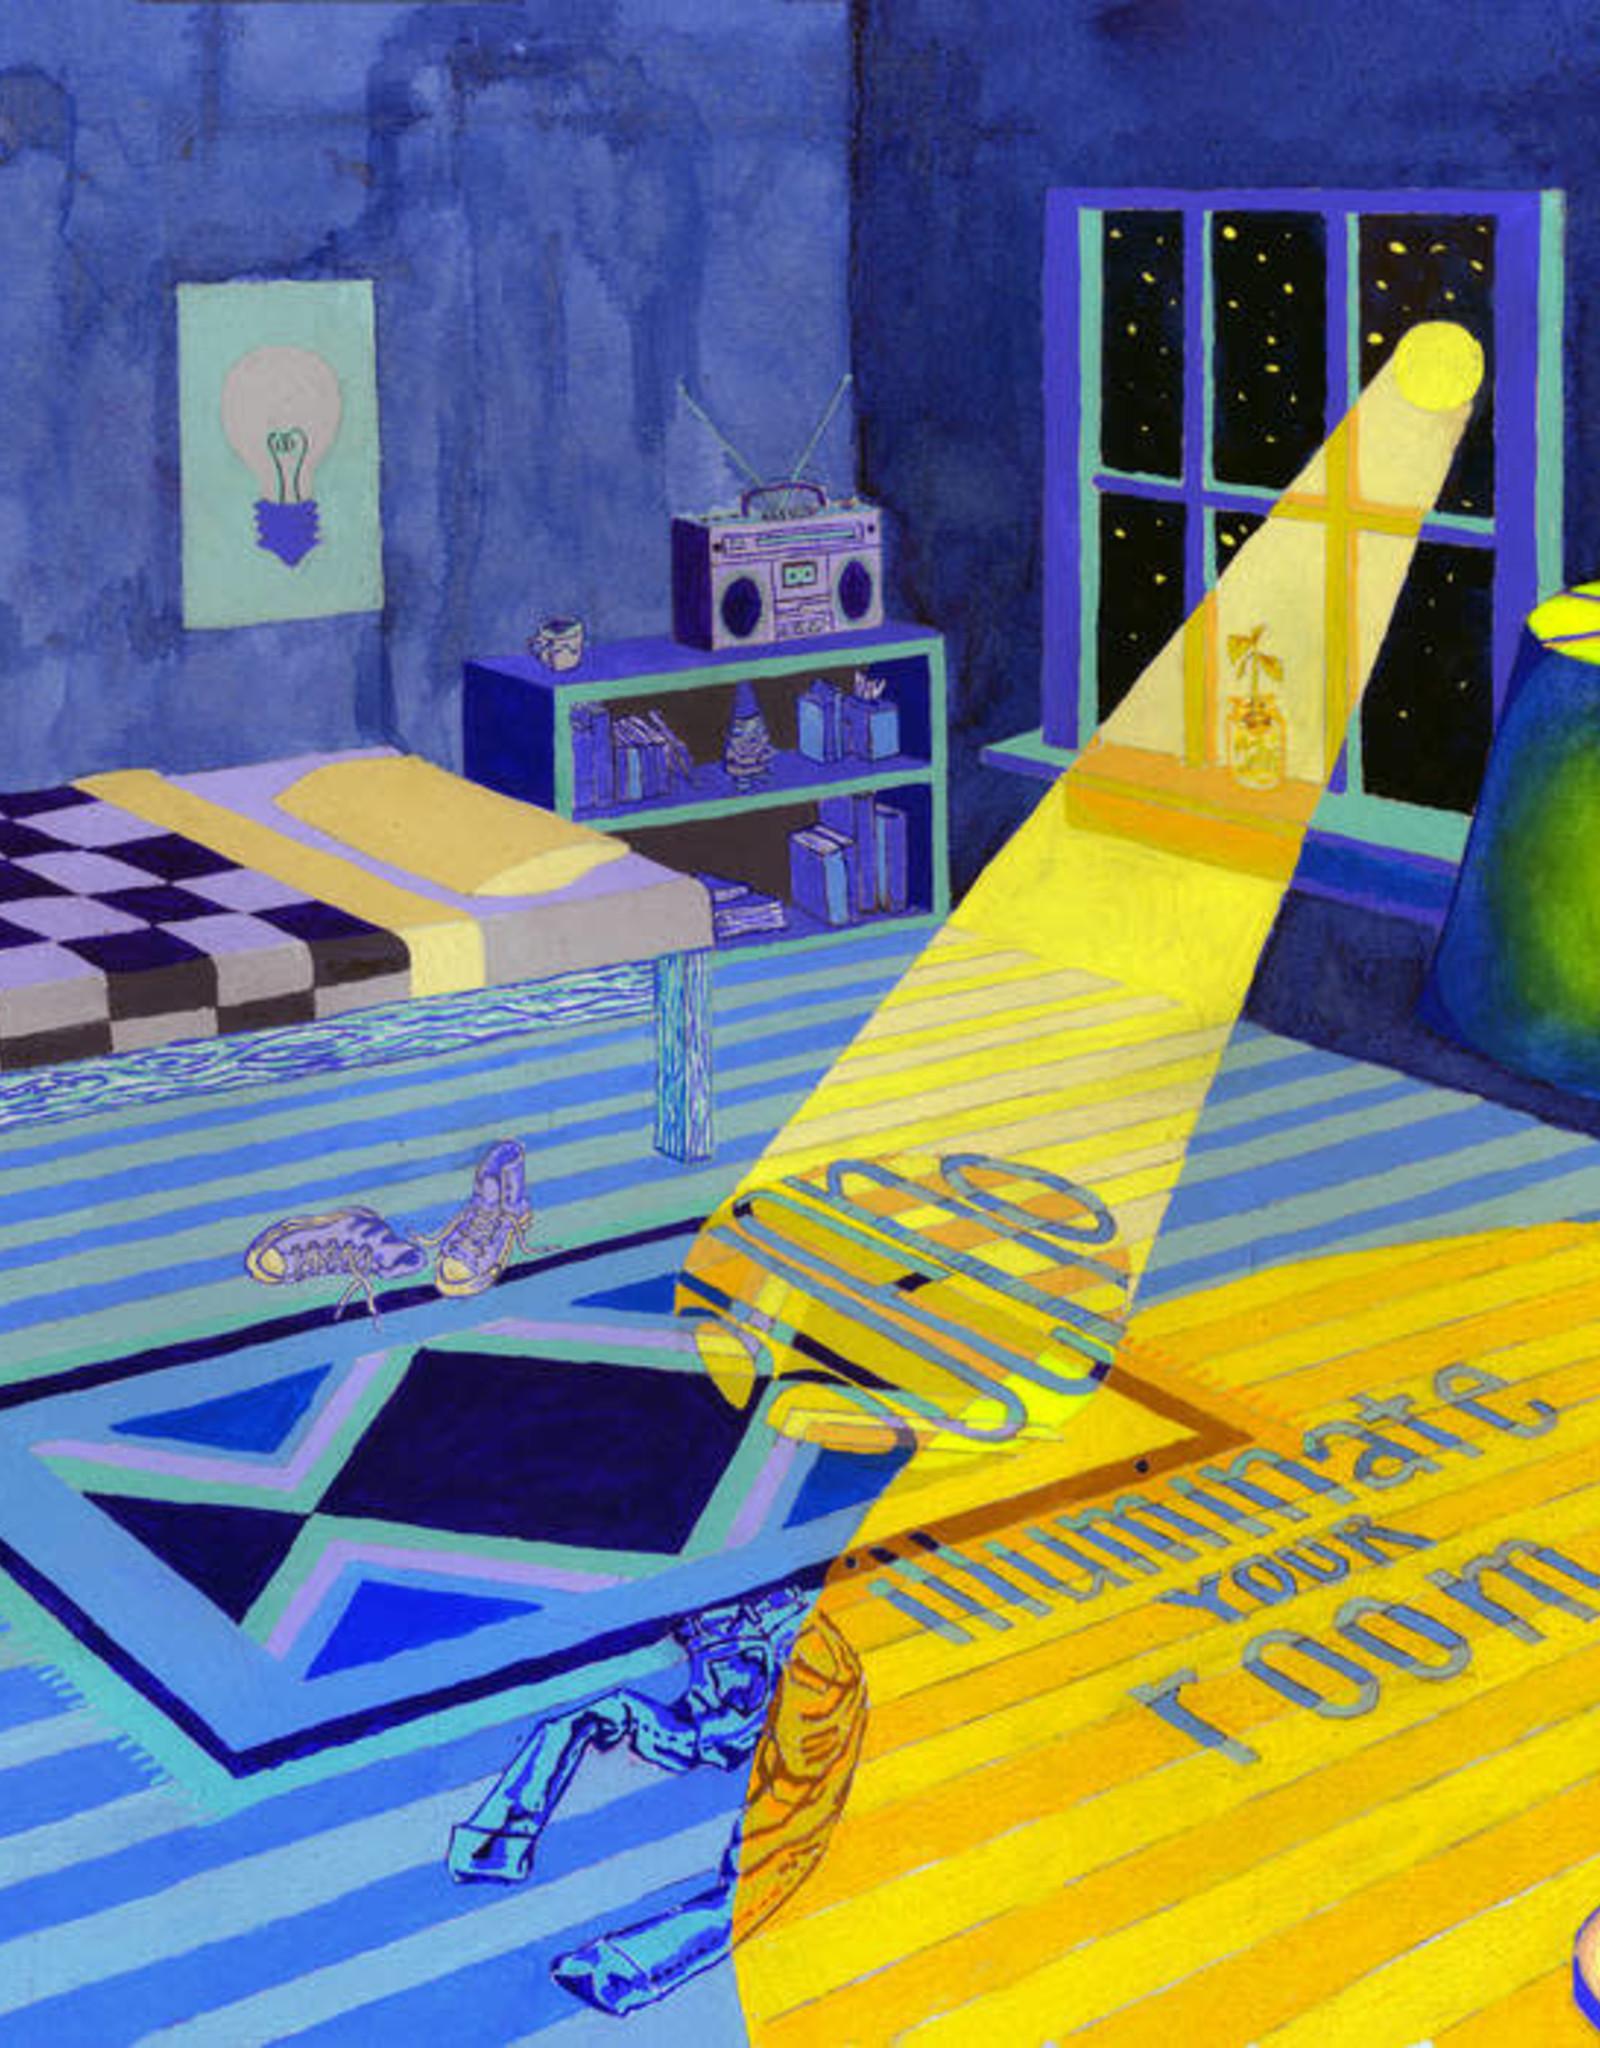 Bueno -  Illuminate Your Room